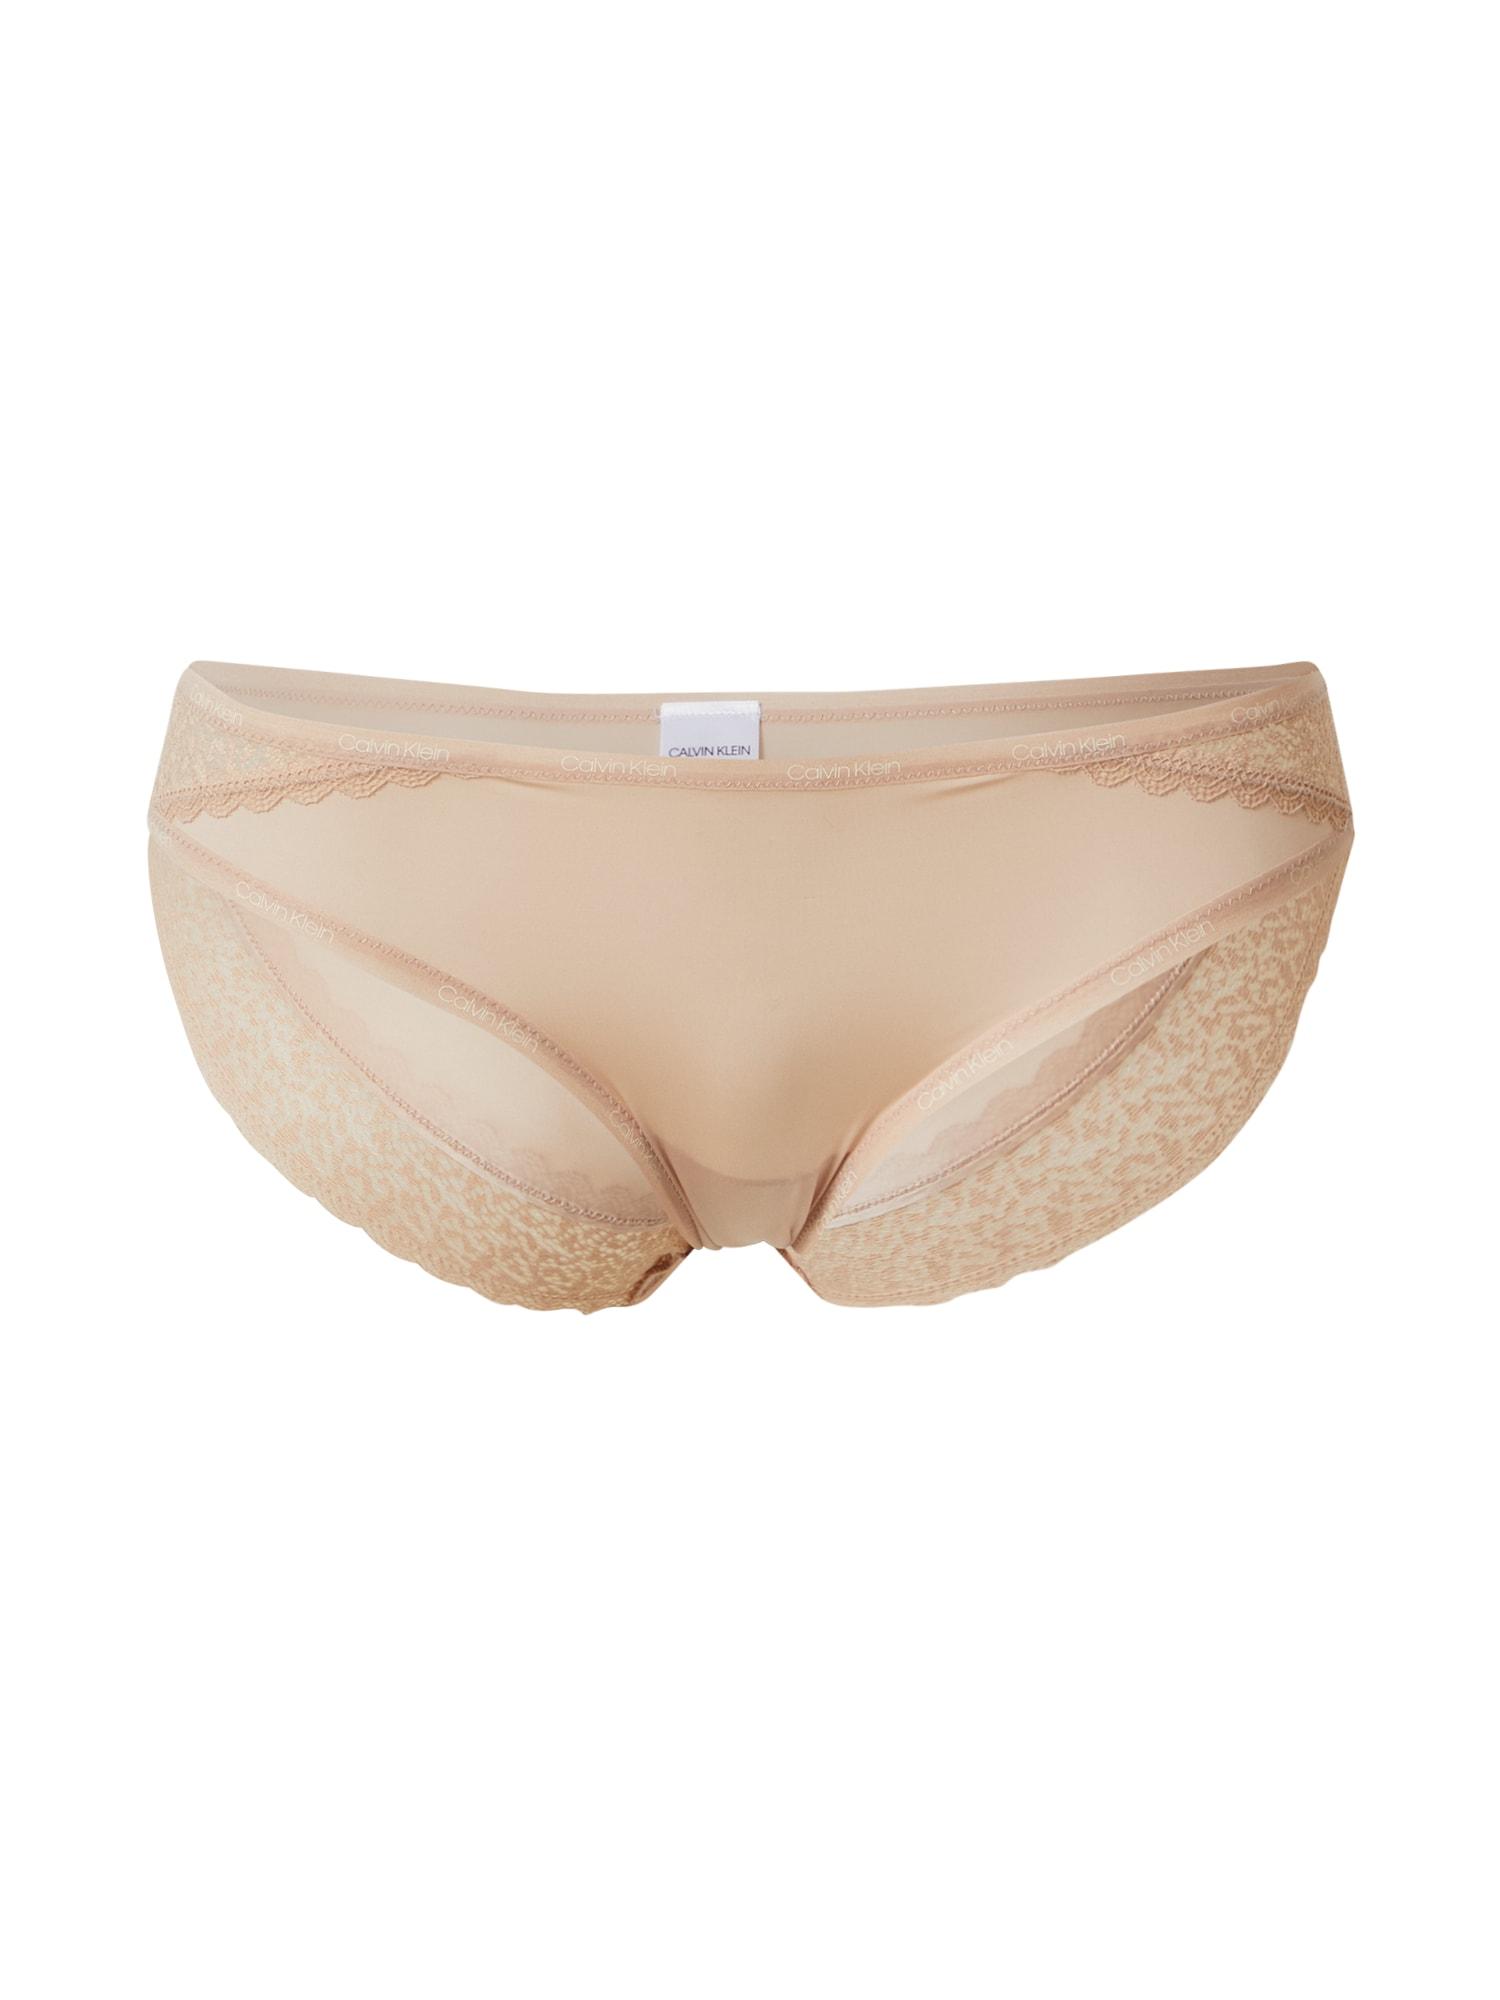 Calvin Klein Underwear Moteriškos kelnaitės 'Flirty' kūno spalva